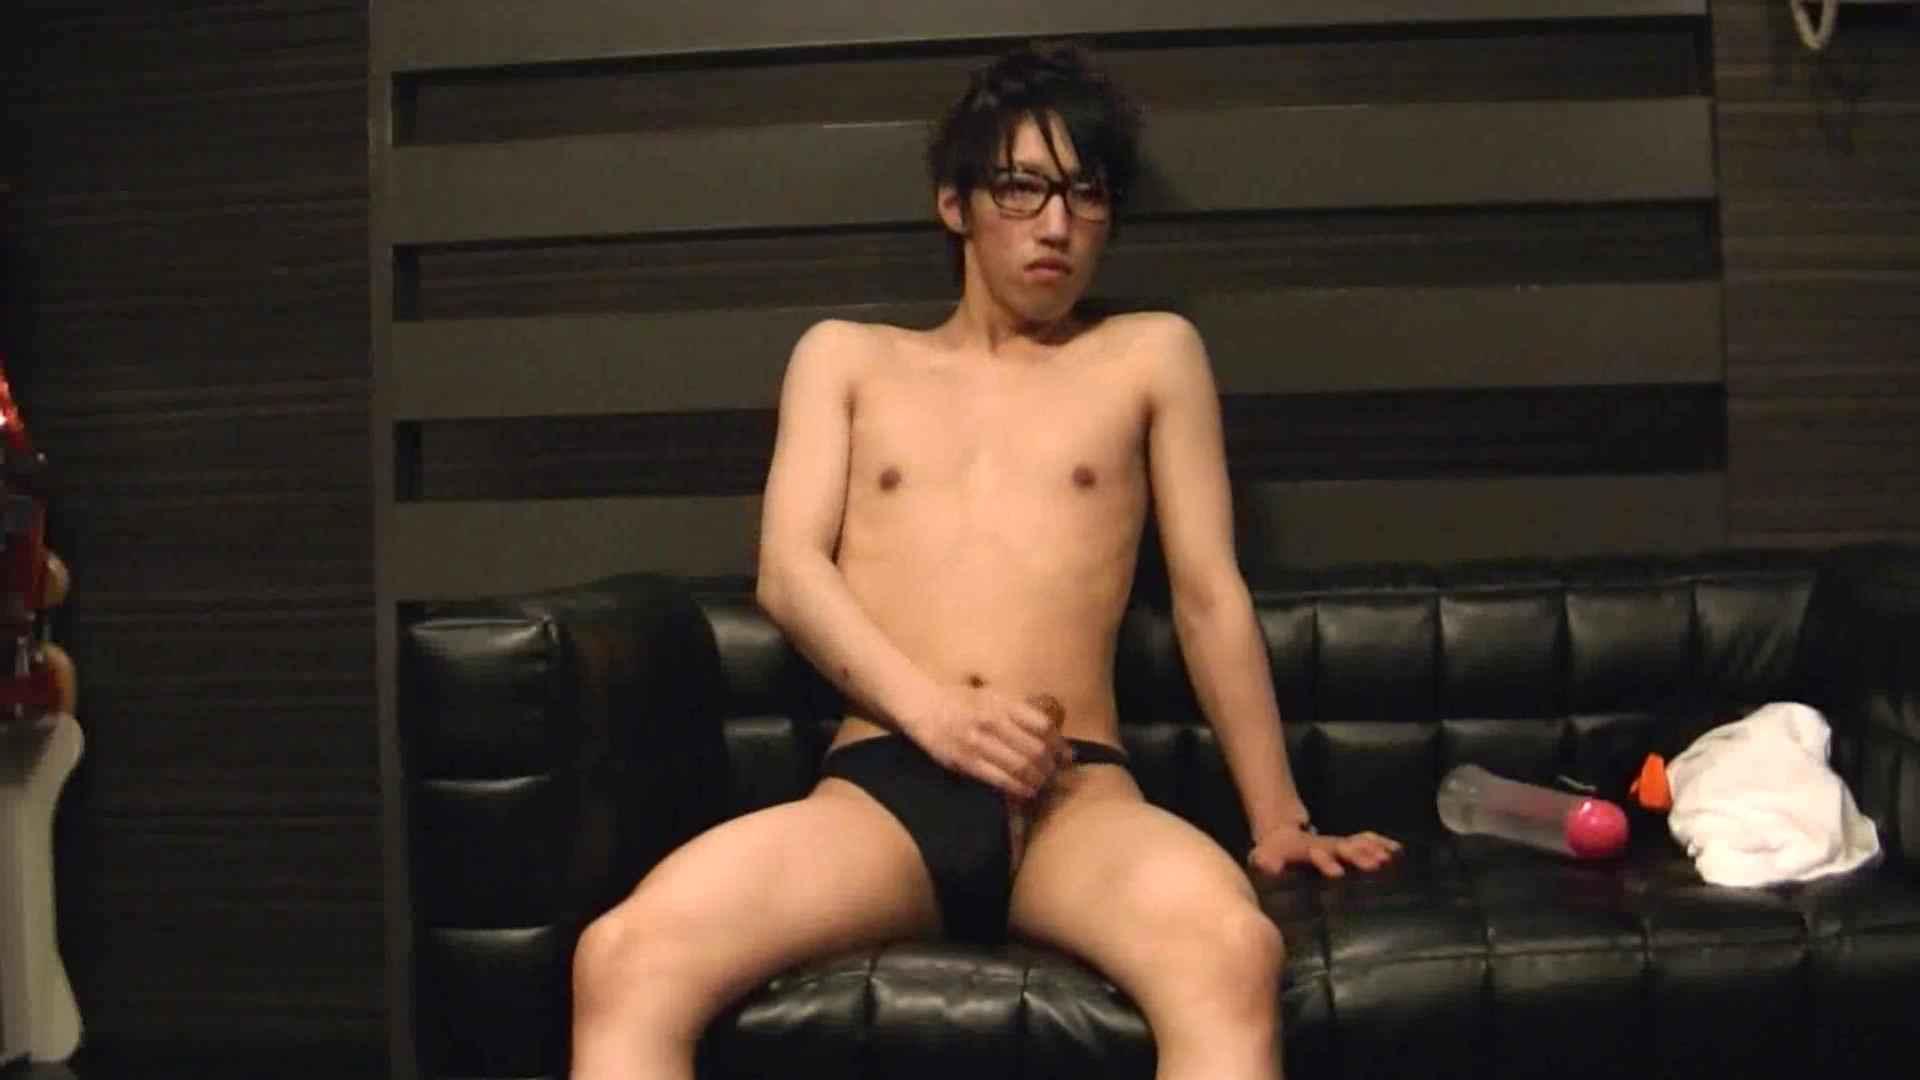 ONA見せカーニバル!! Vol3 男 ゲイ無料無修正画像 89枚 34